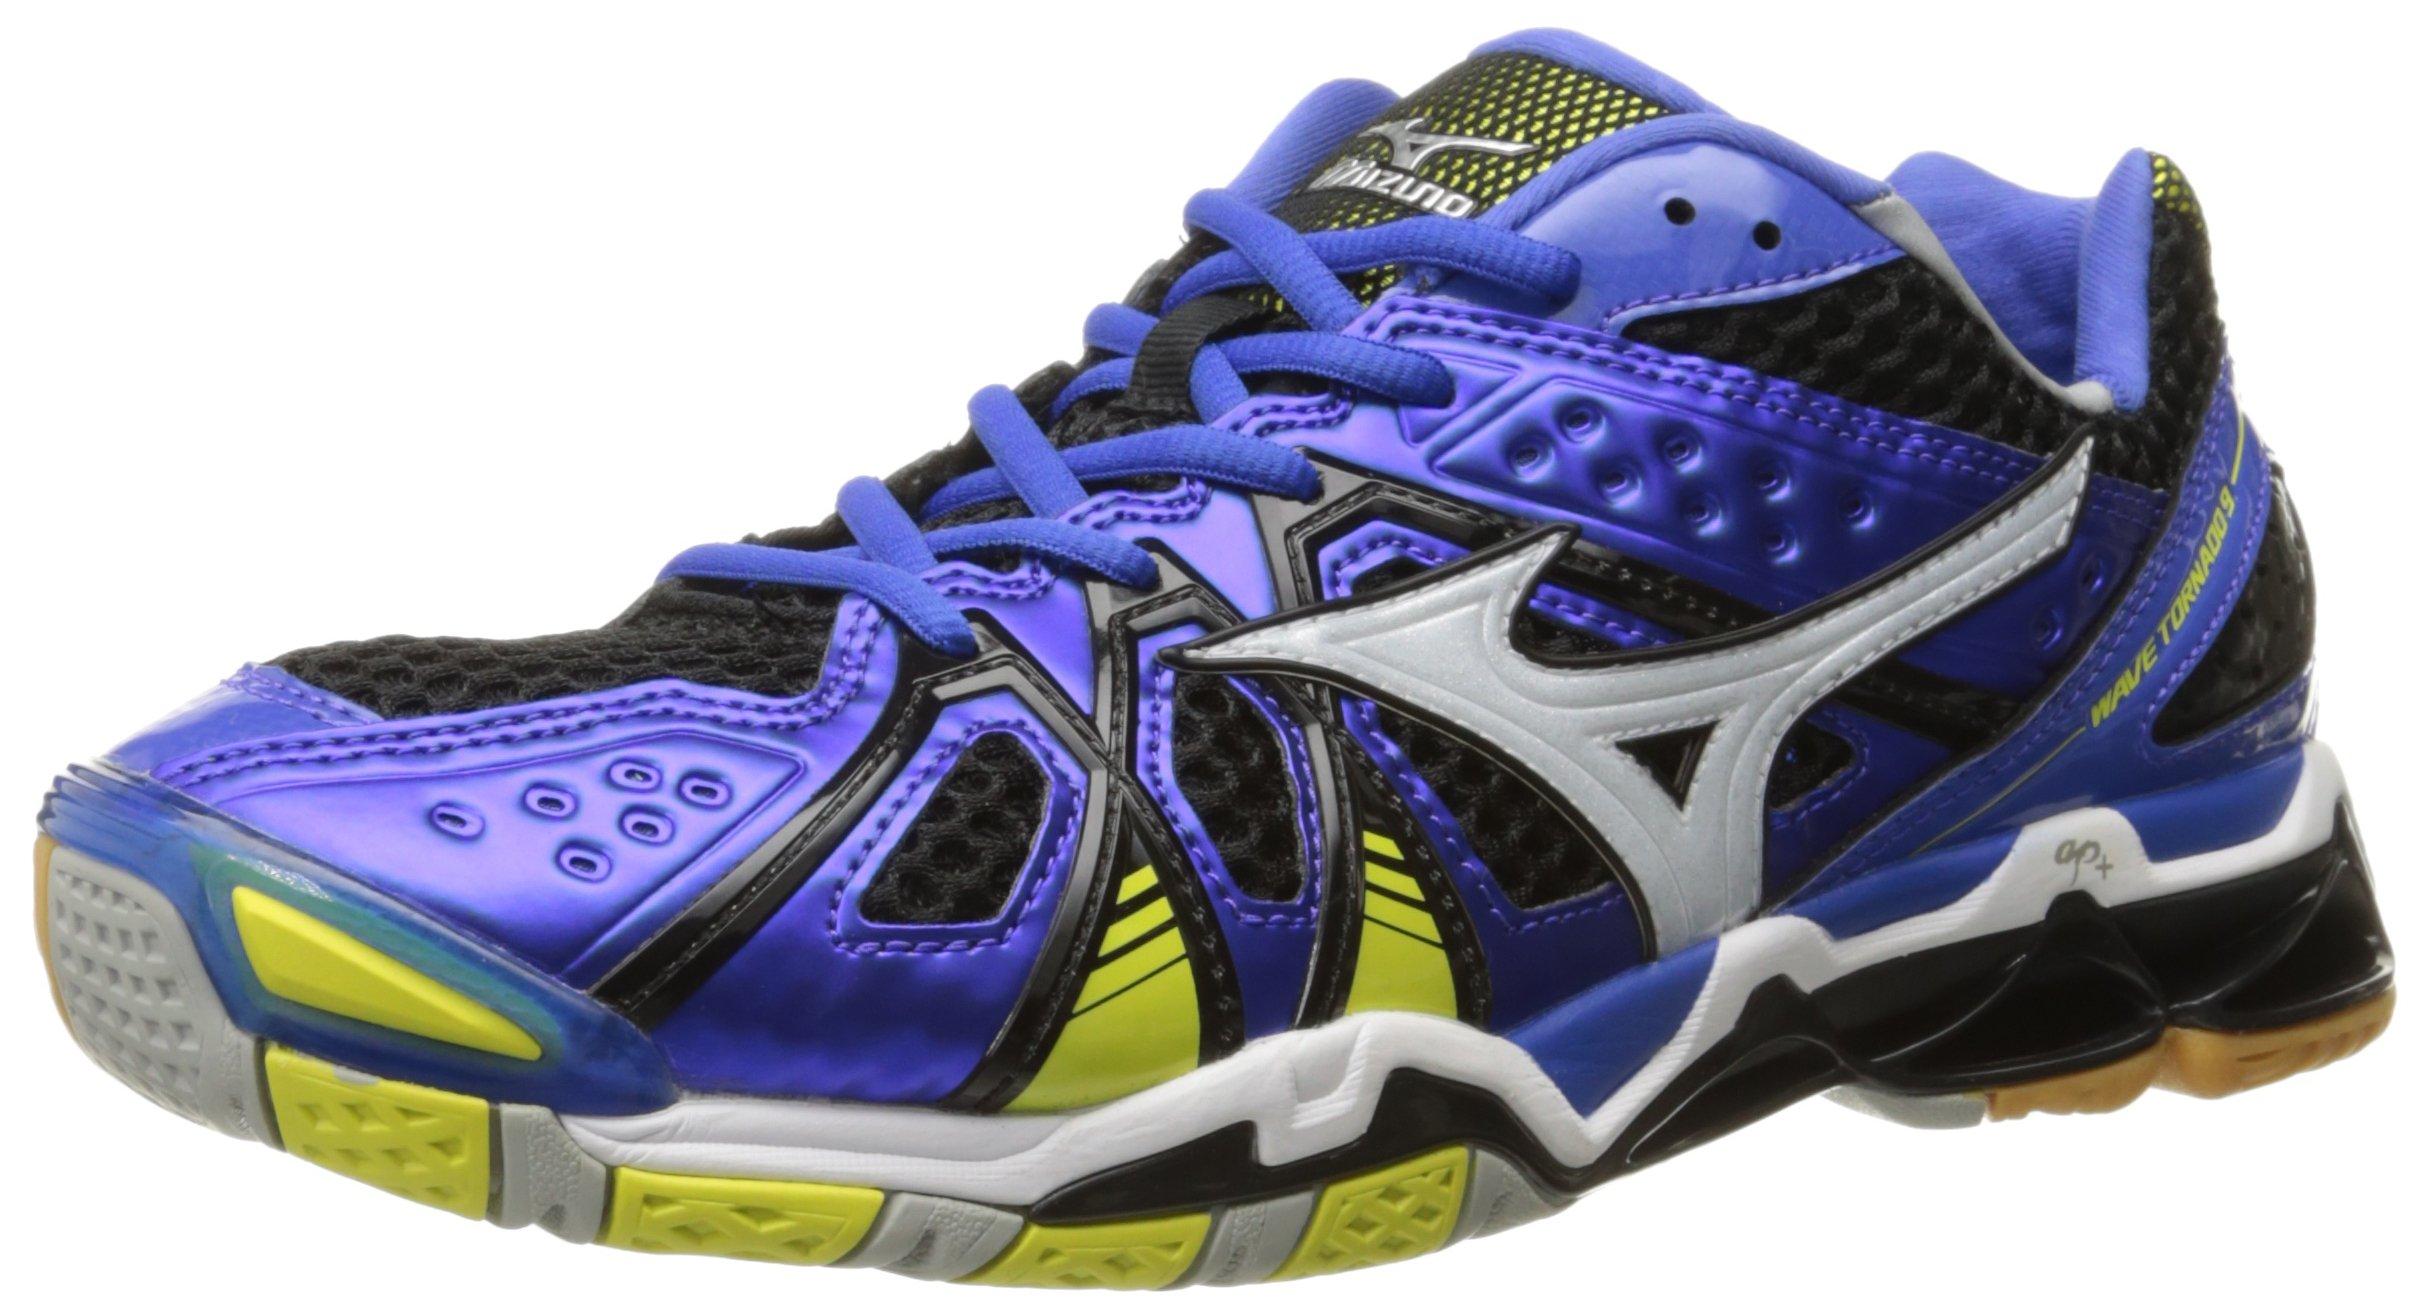 Mizuno Men's Wave Tornado 9 DB-BLT Volleyball Shoe, Dazzling Blue/Bolt, 7 D US